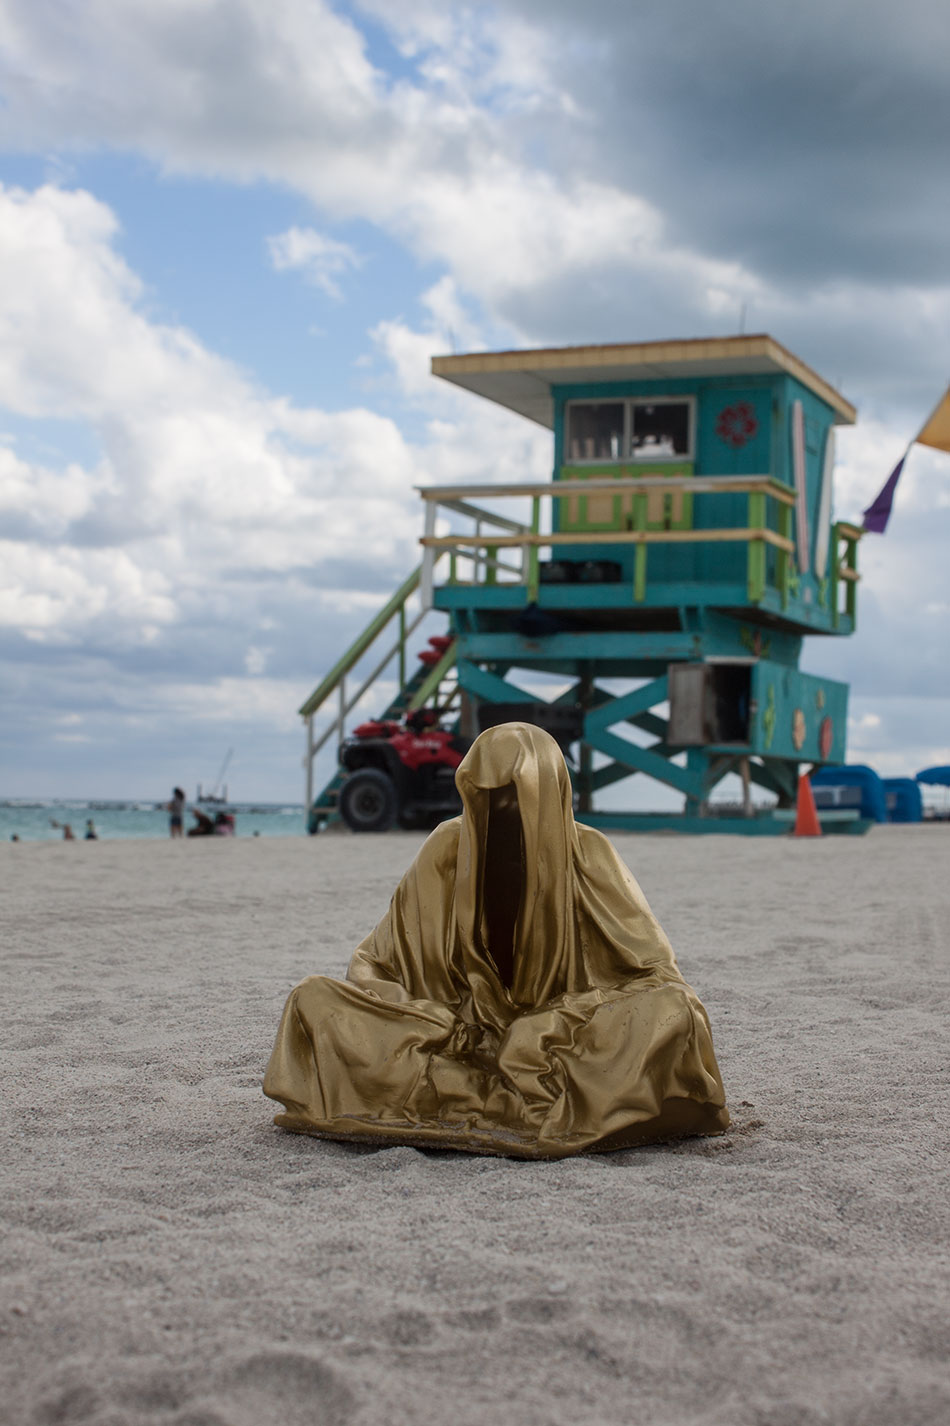 public-art-basel-miami-beach-fair-usa-florida-guardians-of-time-manfred-kili-kielnhofer-contemporary-fine-art-modern-arts-design-antiques-sculpture-6911